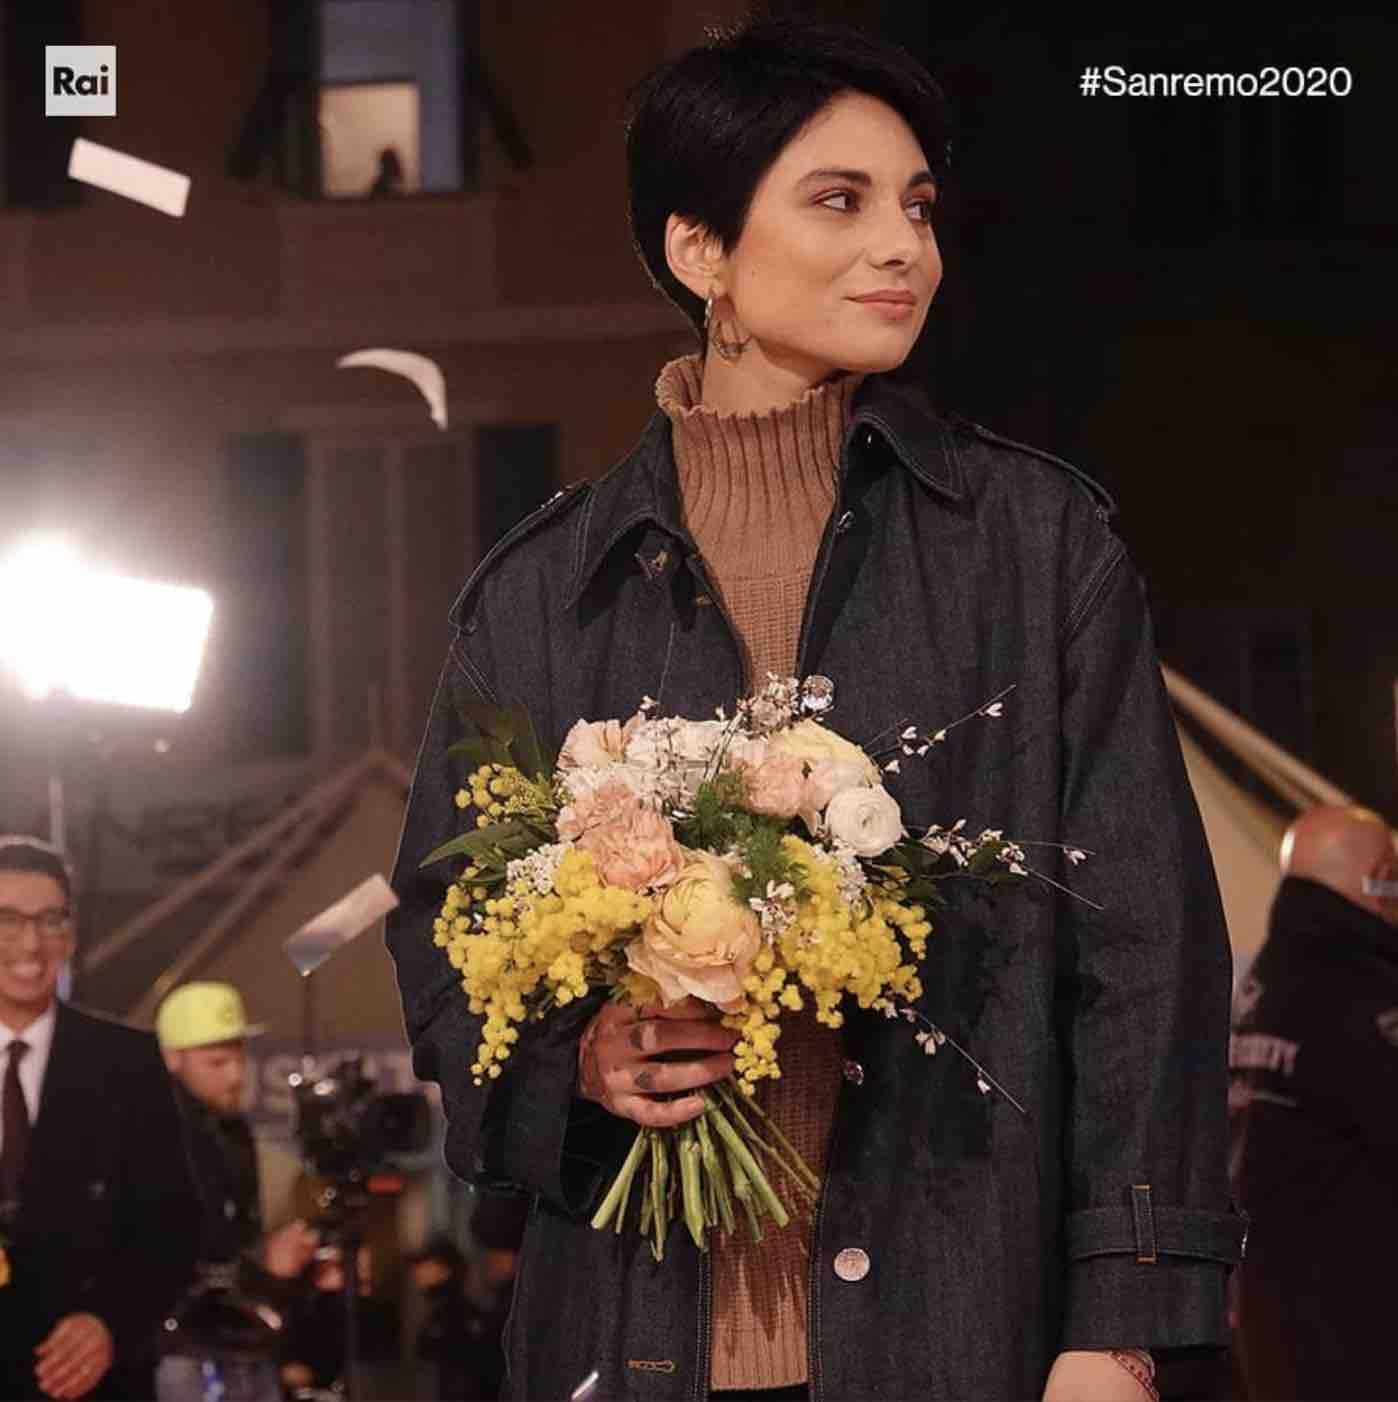 Giordana Angi Sanremo 2020